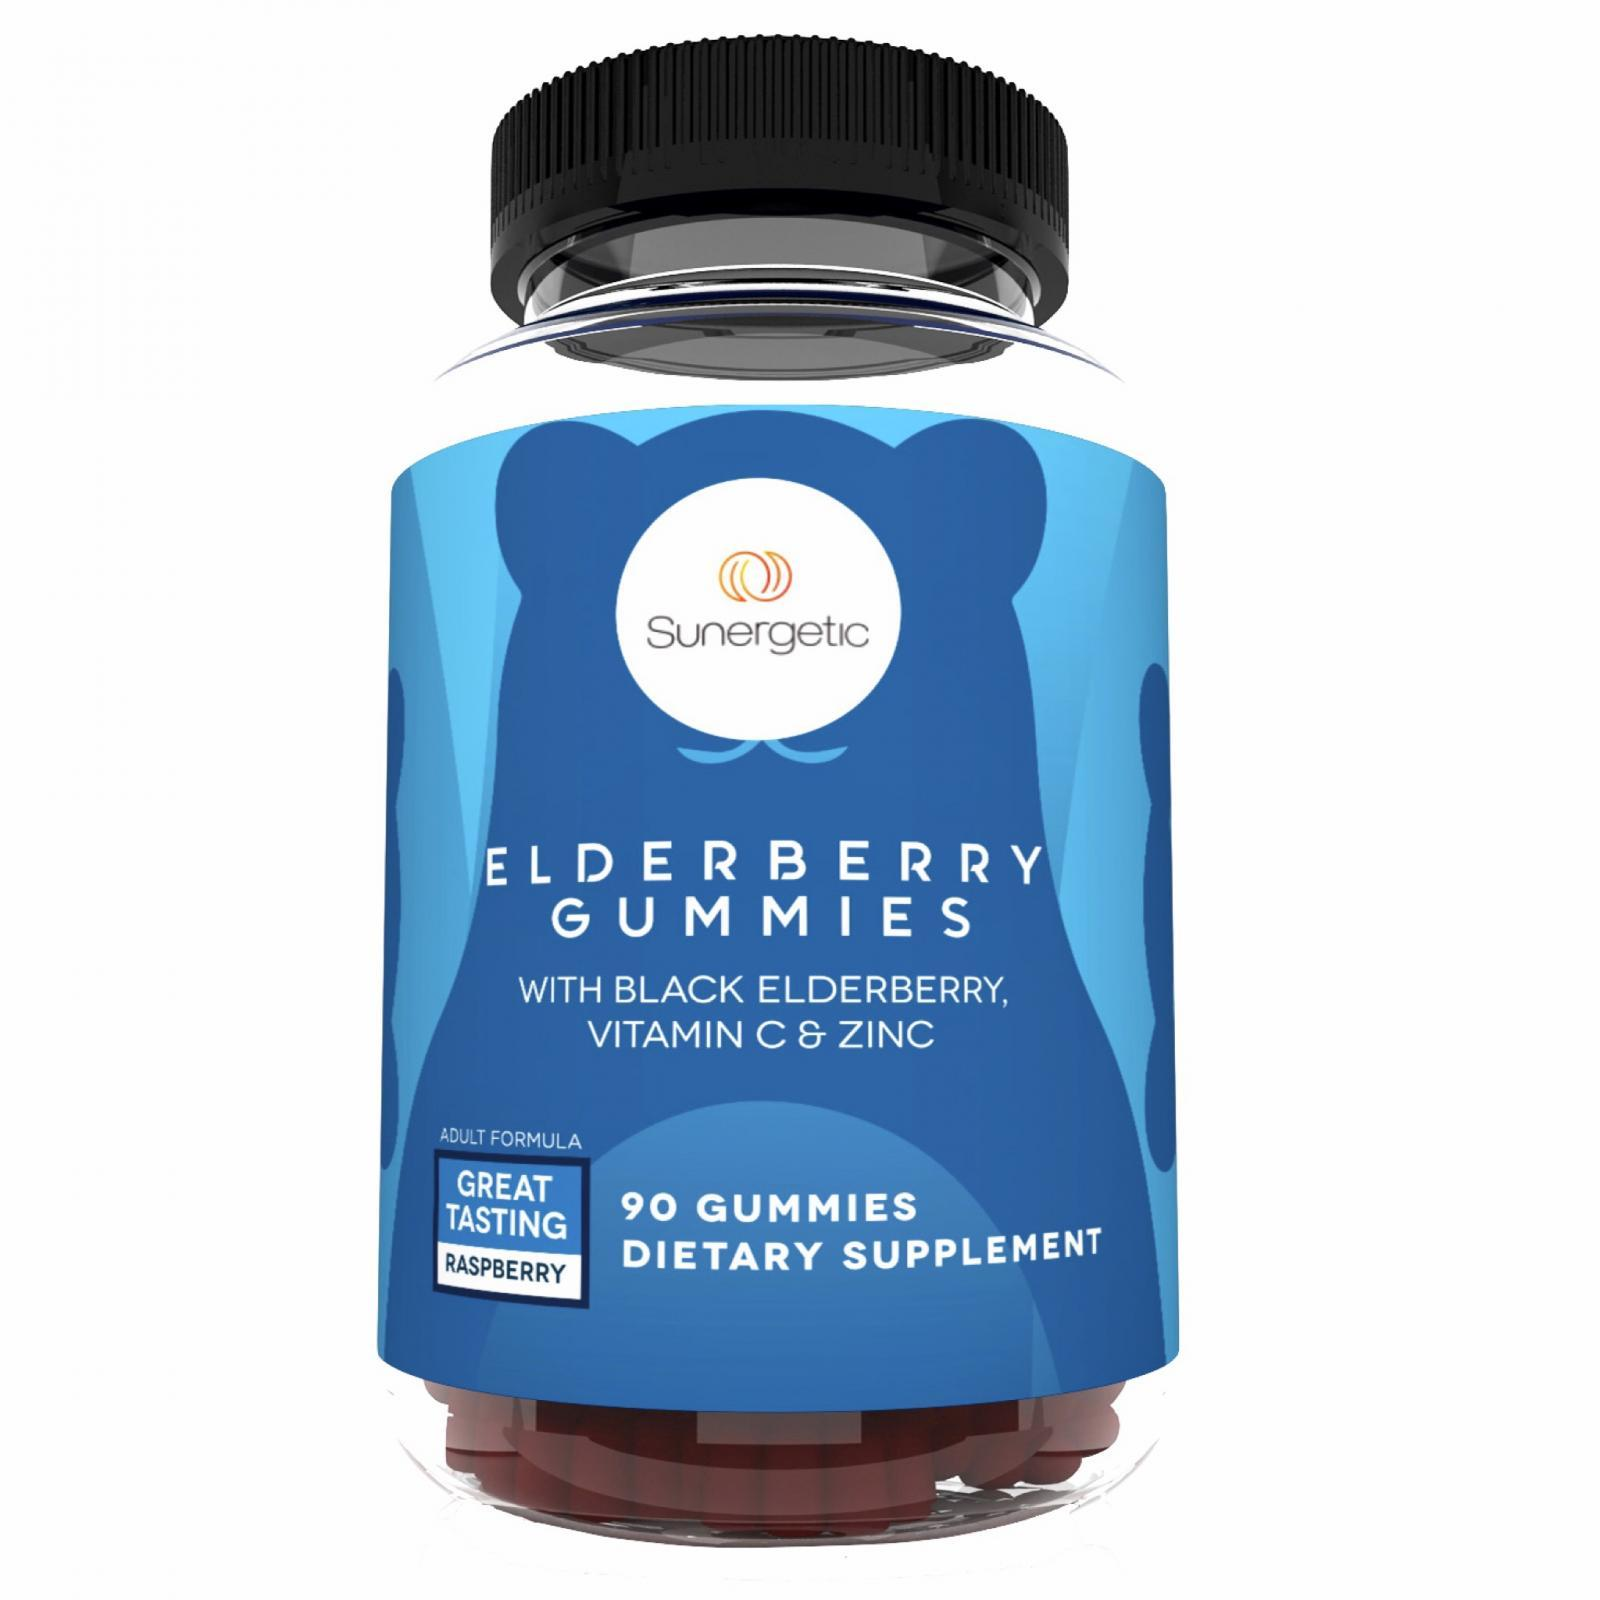 Sunergetic Premium Black Elderberry Gummies with Vitamin C & Zinc